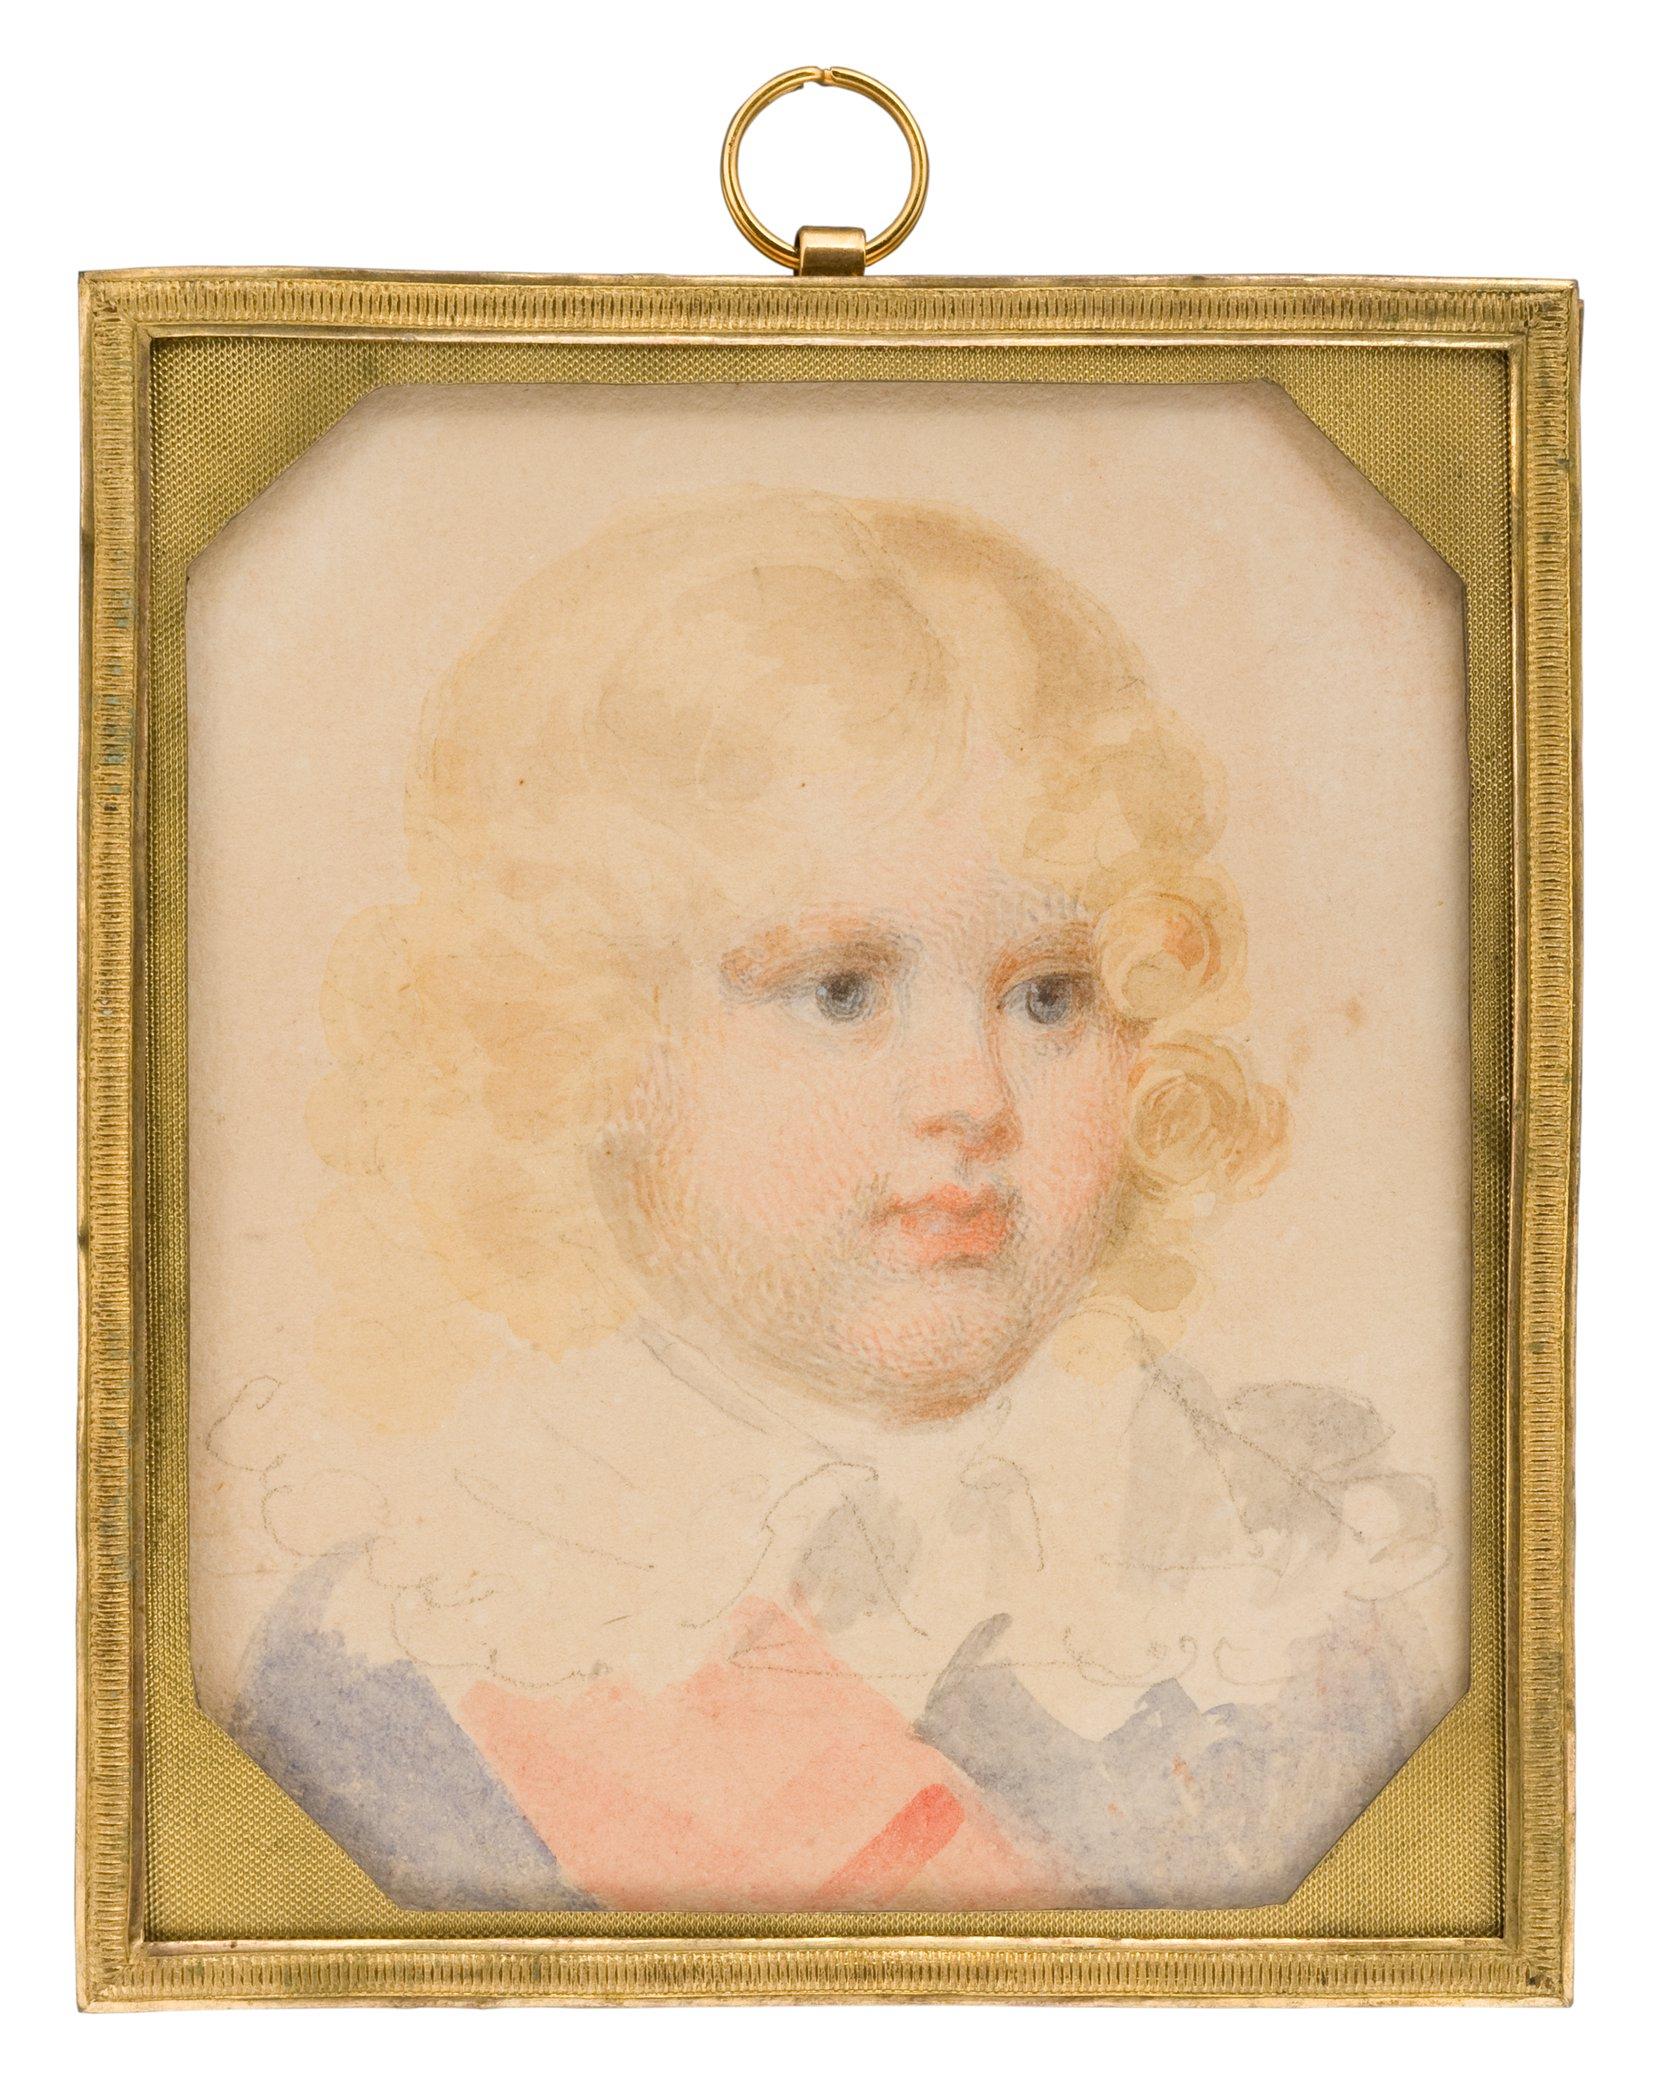 napoléon françois joseph charles bonaparte, king of rome -- jean-baptiste isabey art